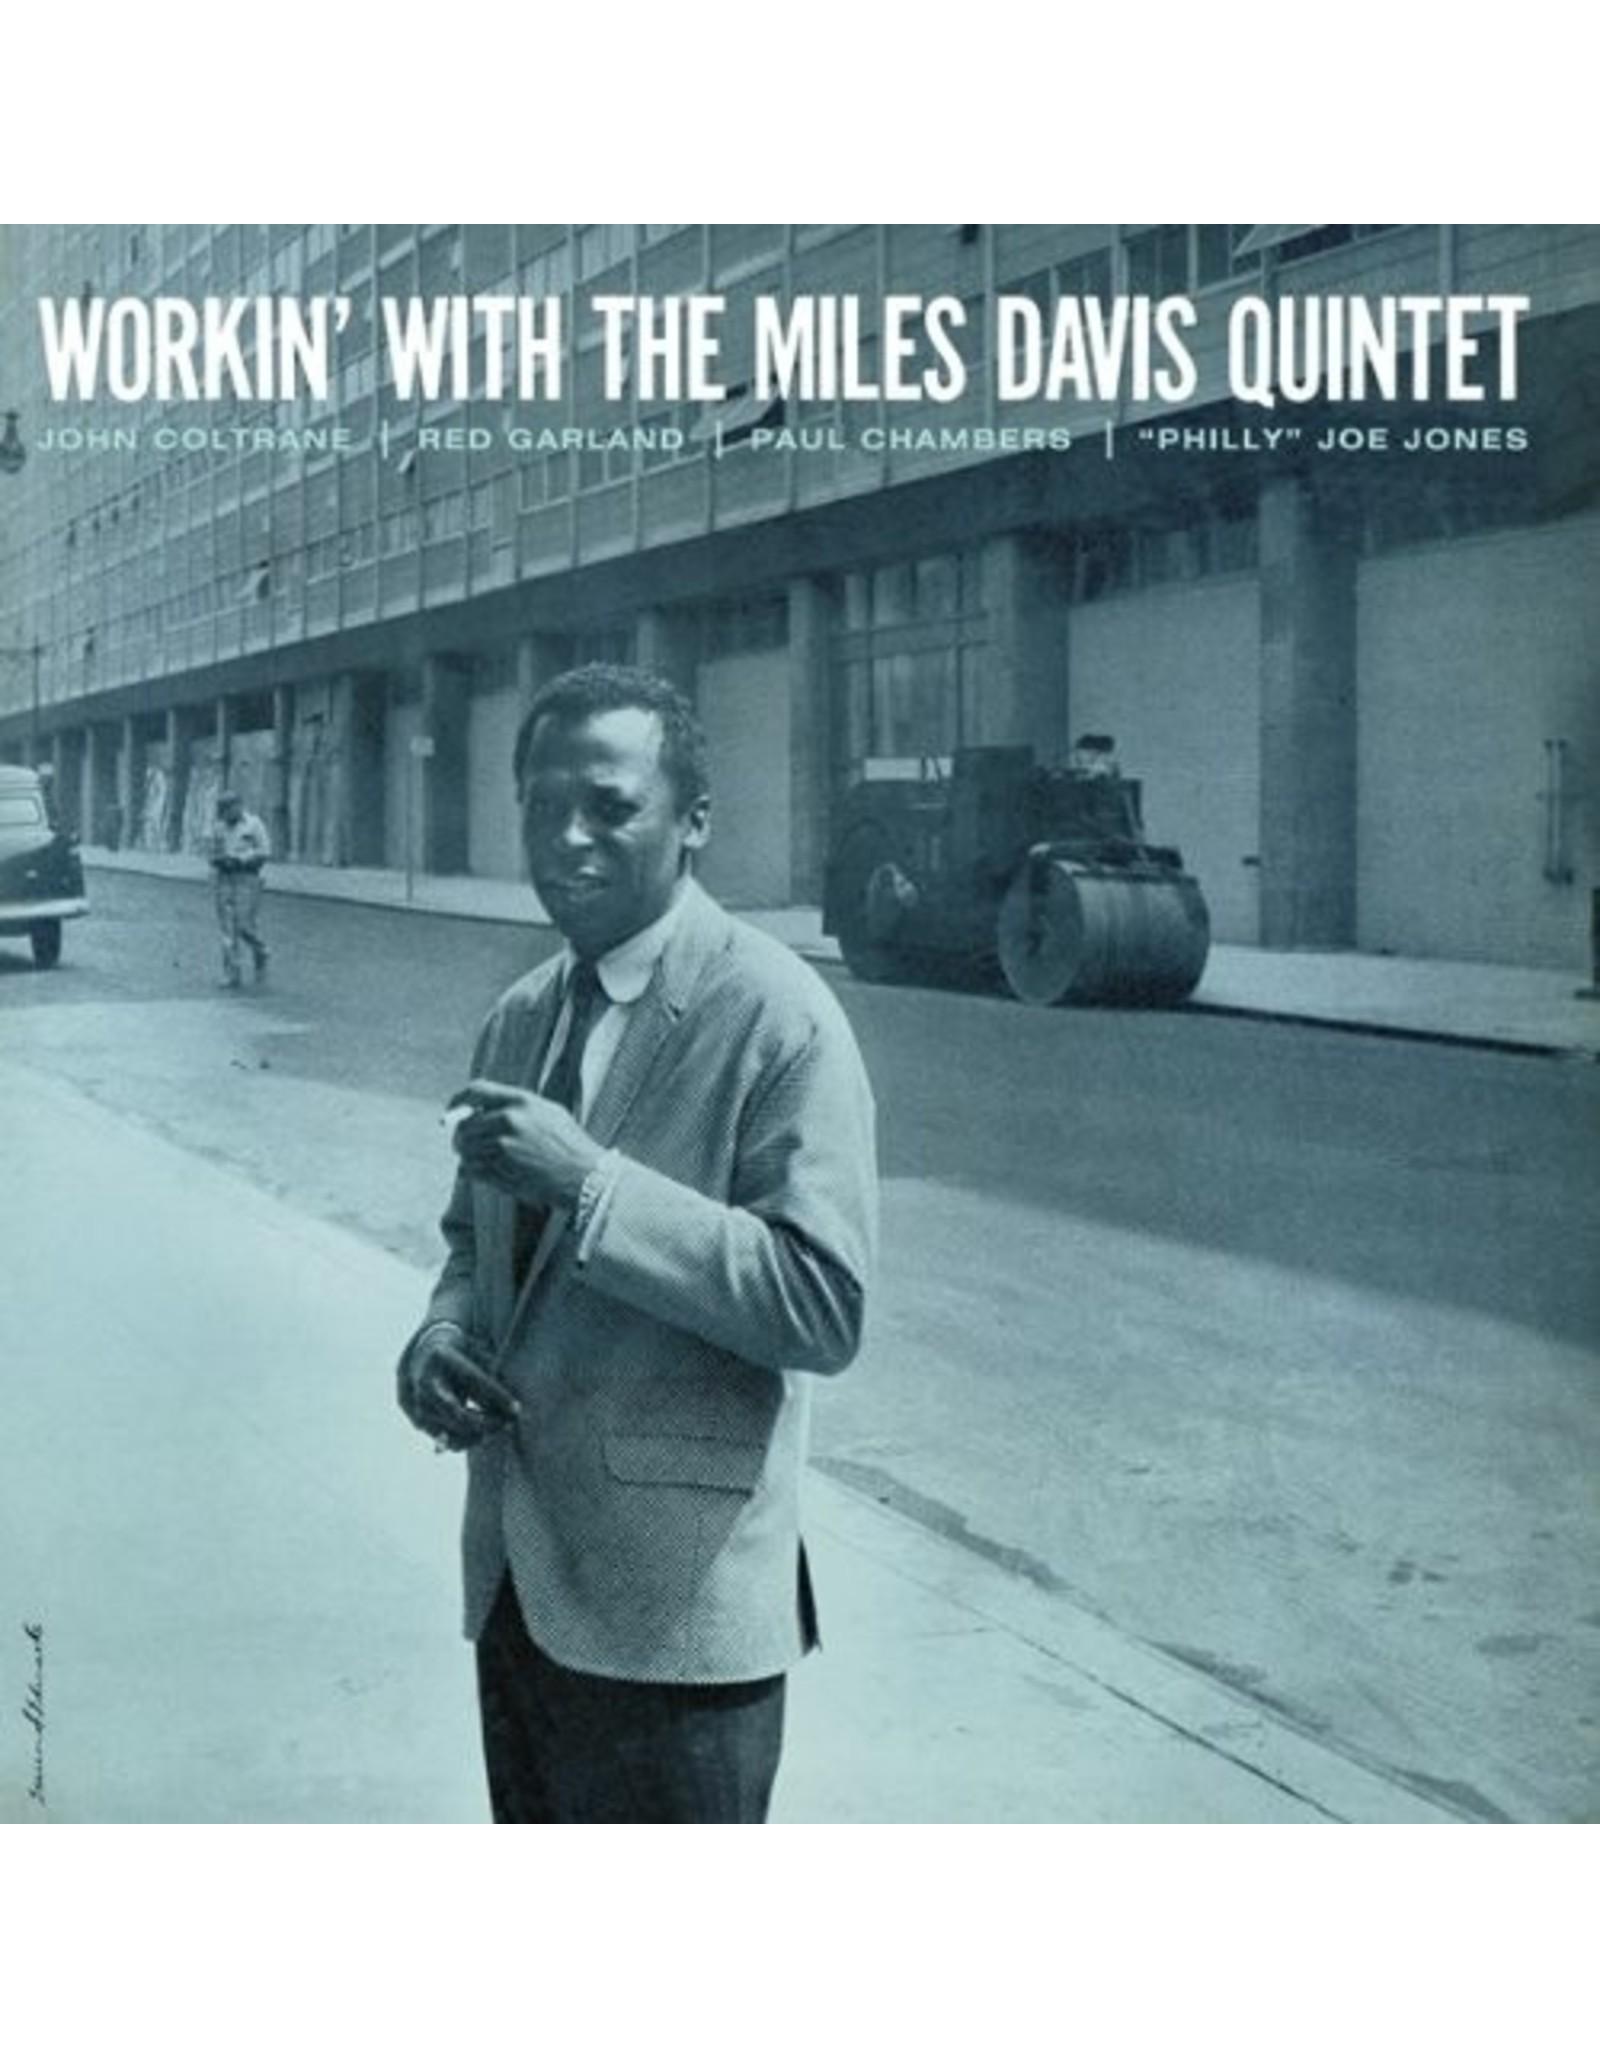 New Vinyl Miles Davis - Workin' With The Miles Davis Quintet LP